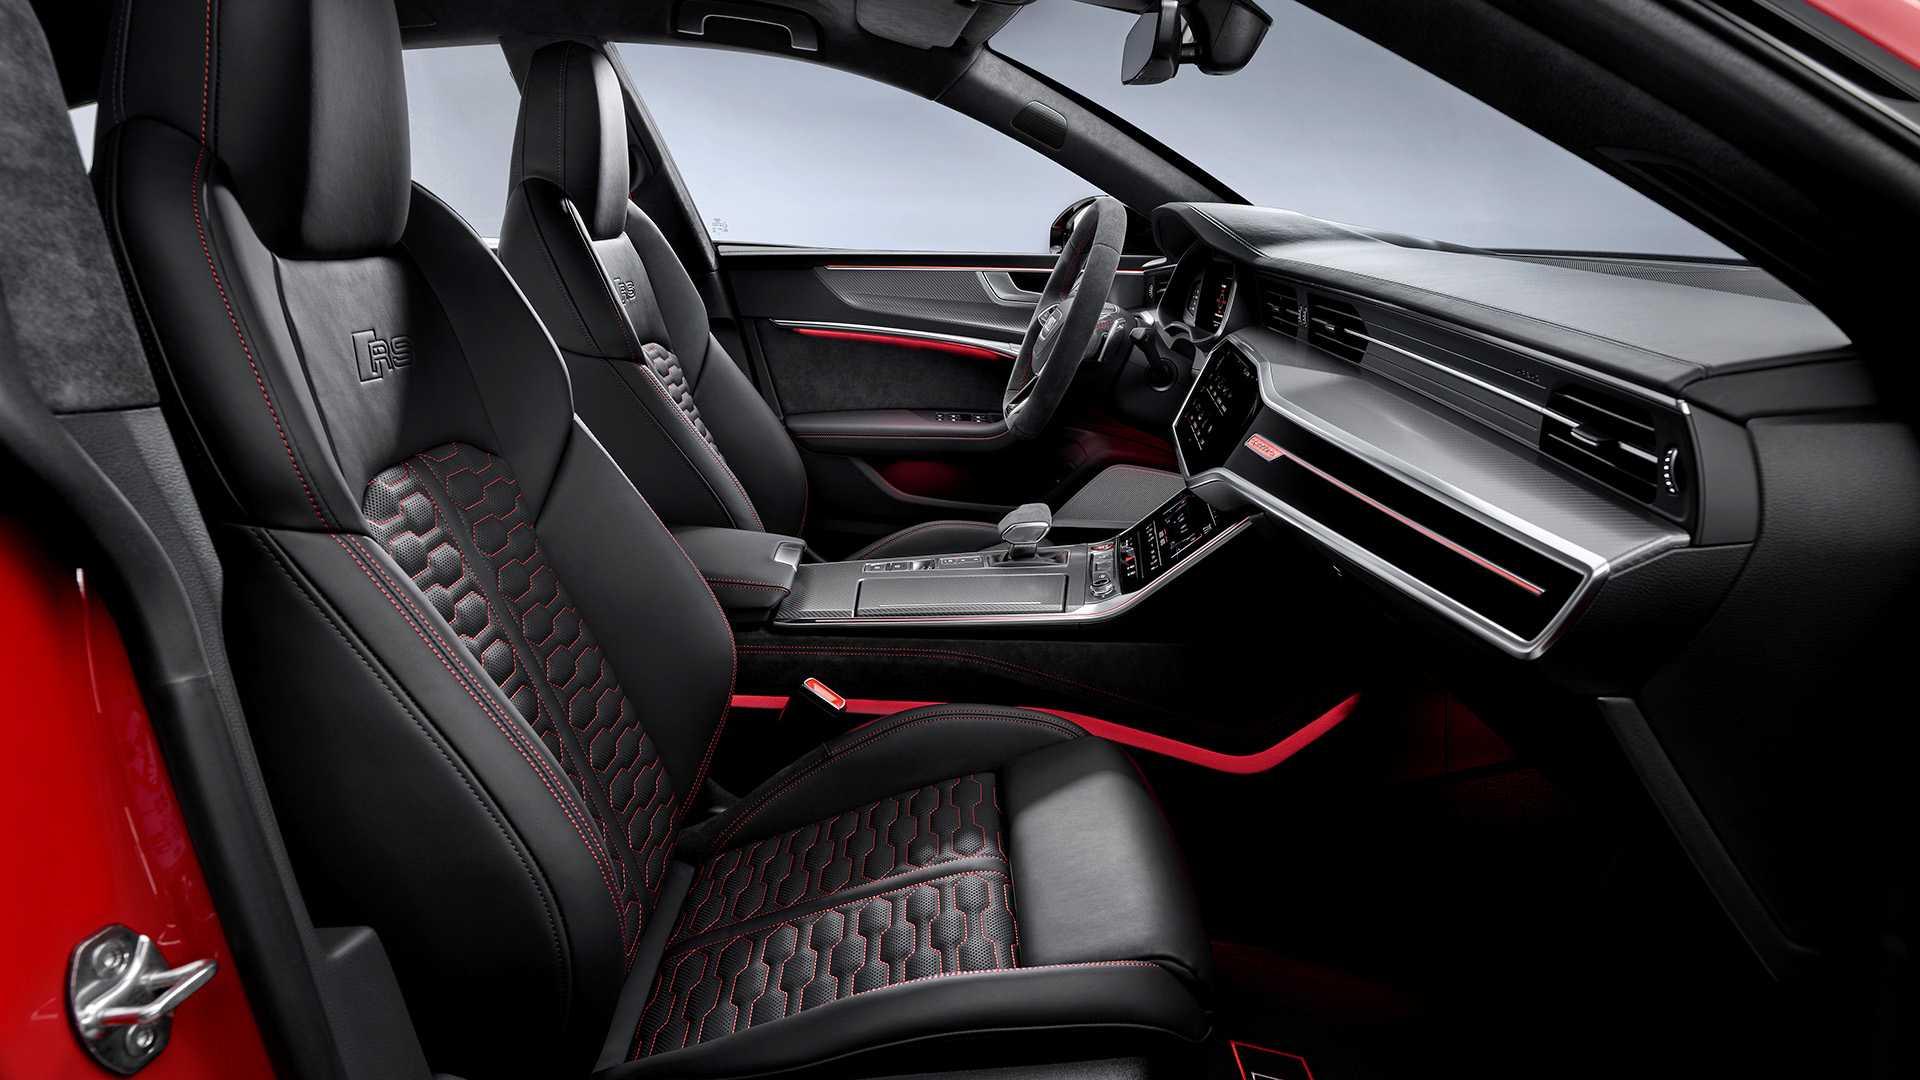 V8发动机配合48V轻混 全新一代奥迪RS 7 Sportback官图正式发布